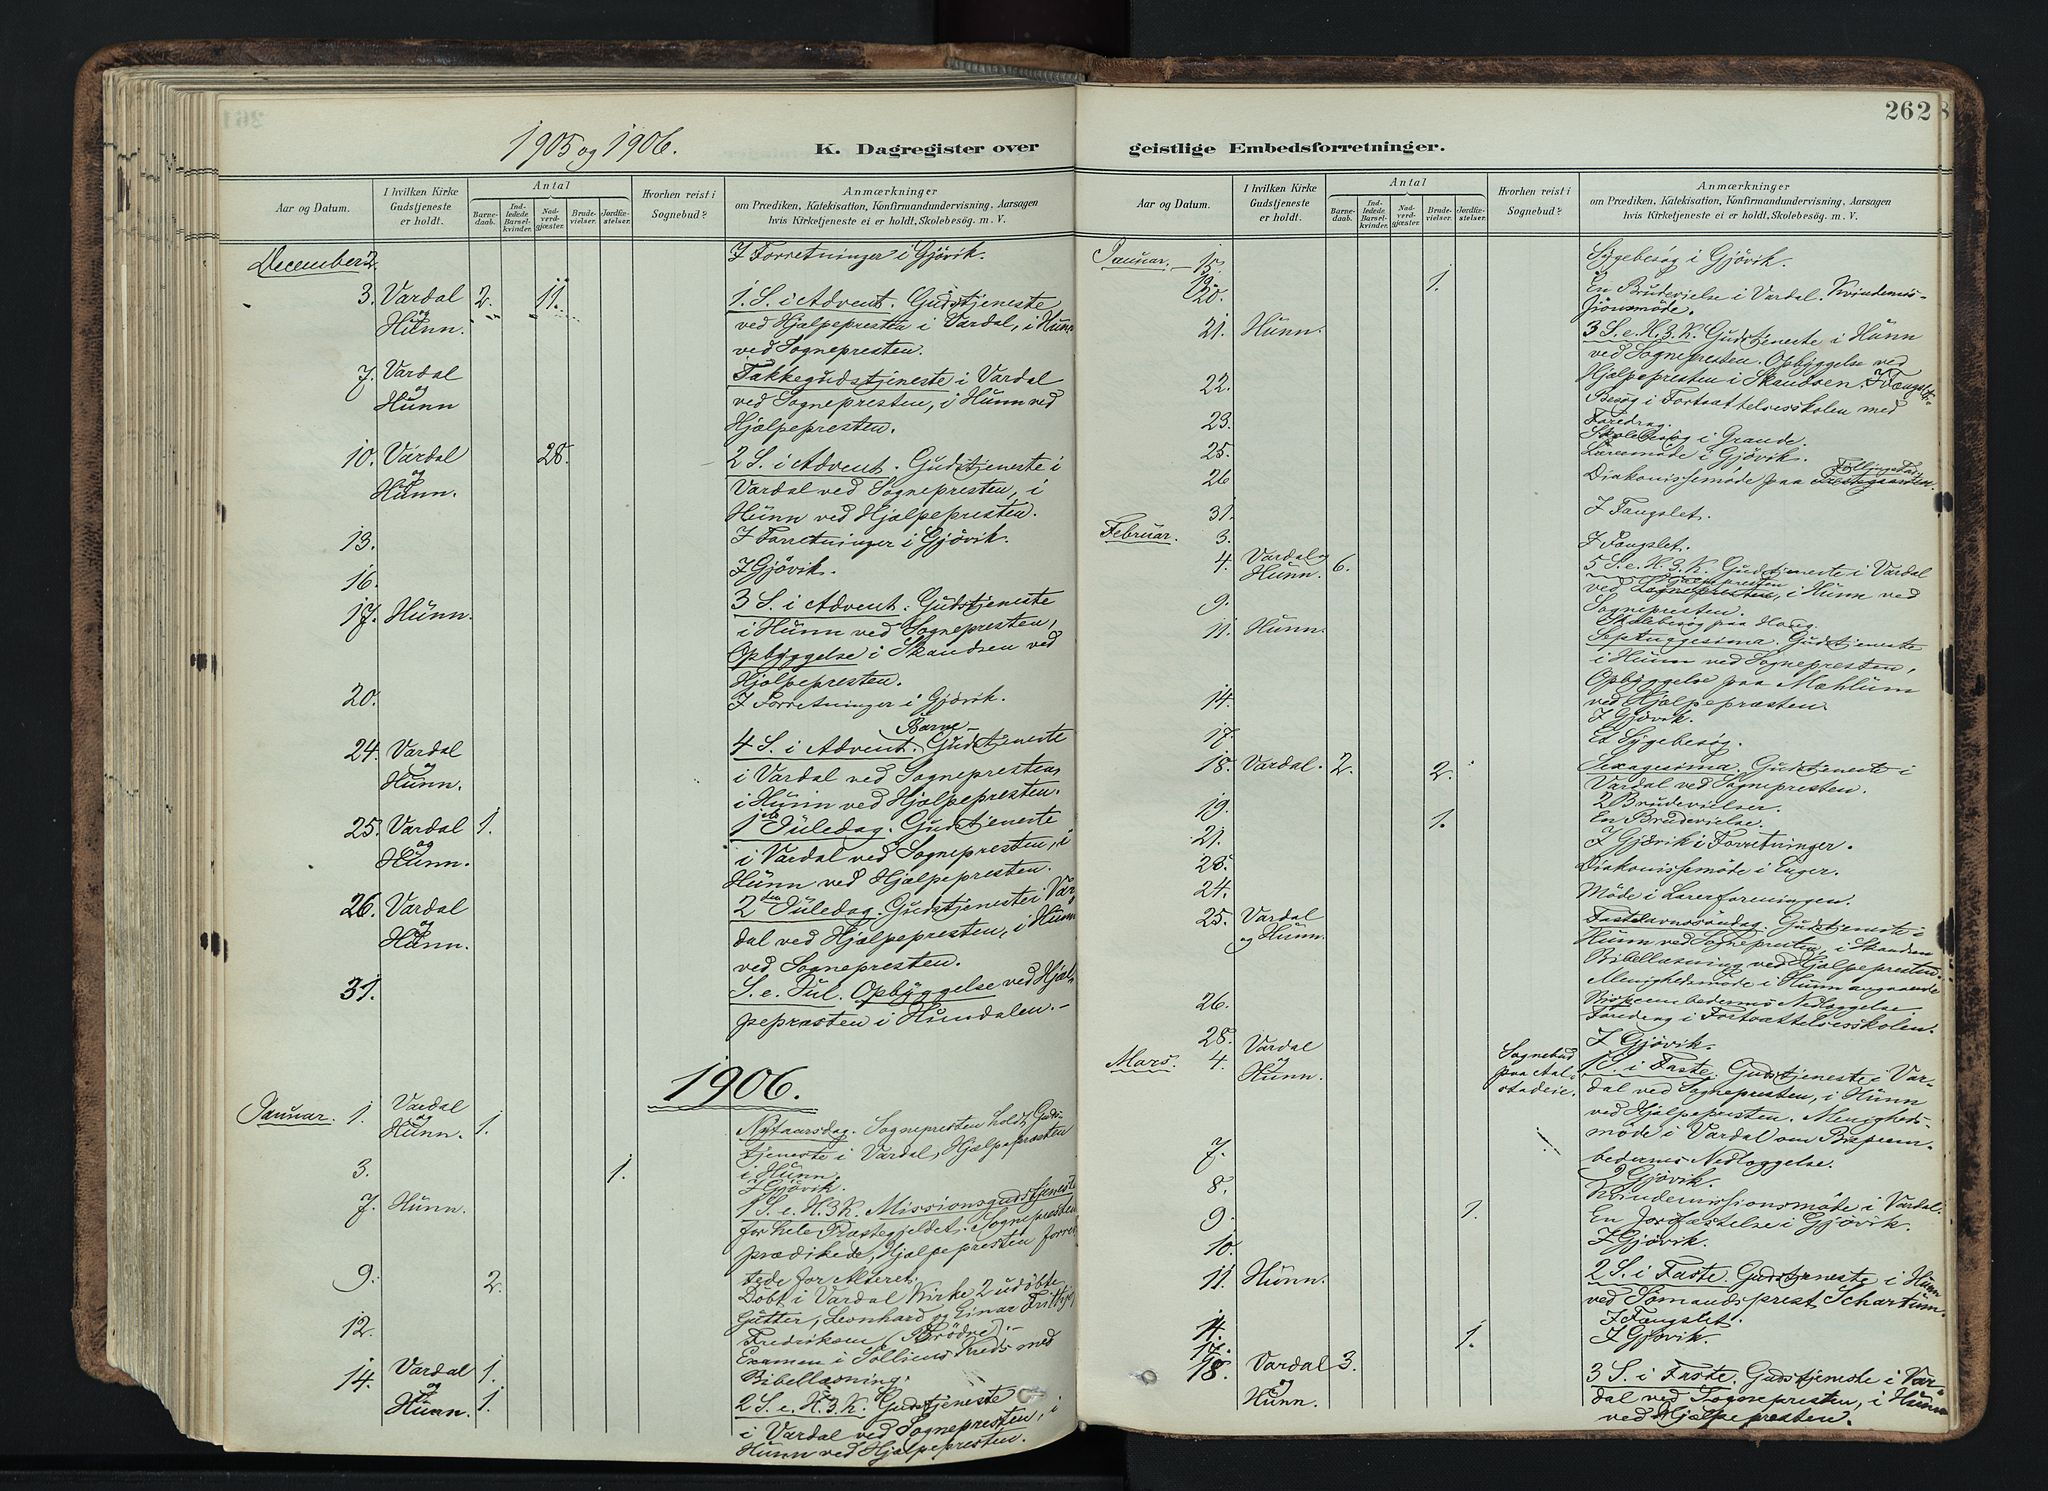 SAH, Vardal prestekontor, H/Ha/Haa/L0019: Ministerialbok nr. 19, 1893-1907, s. 262